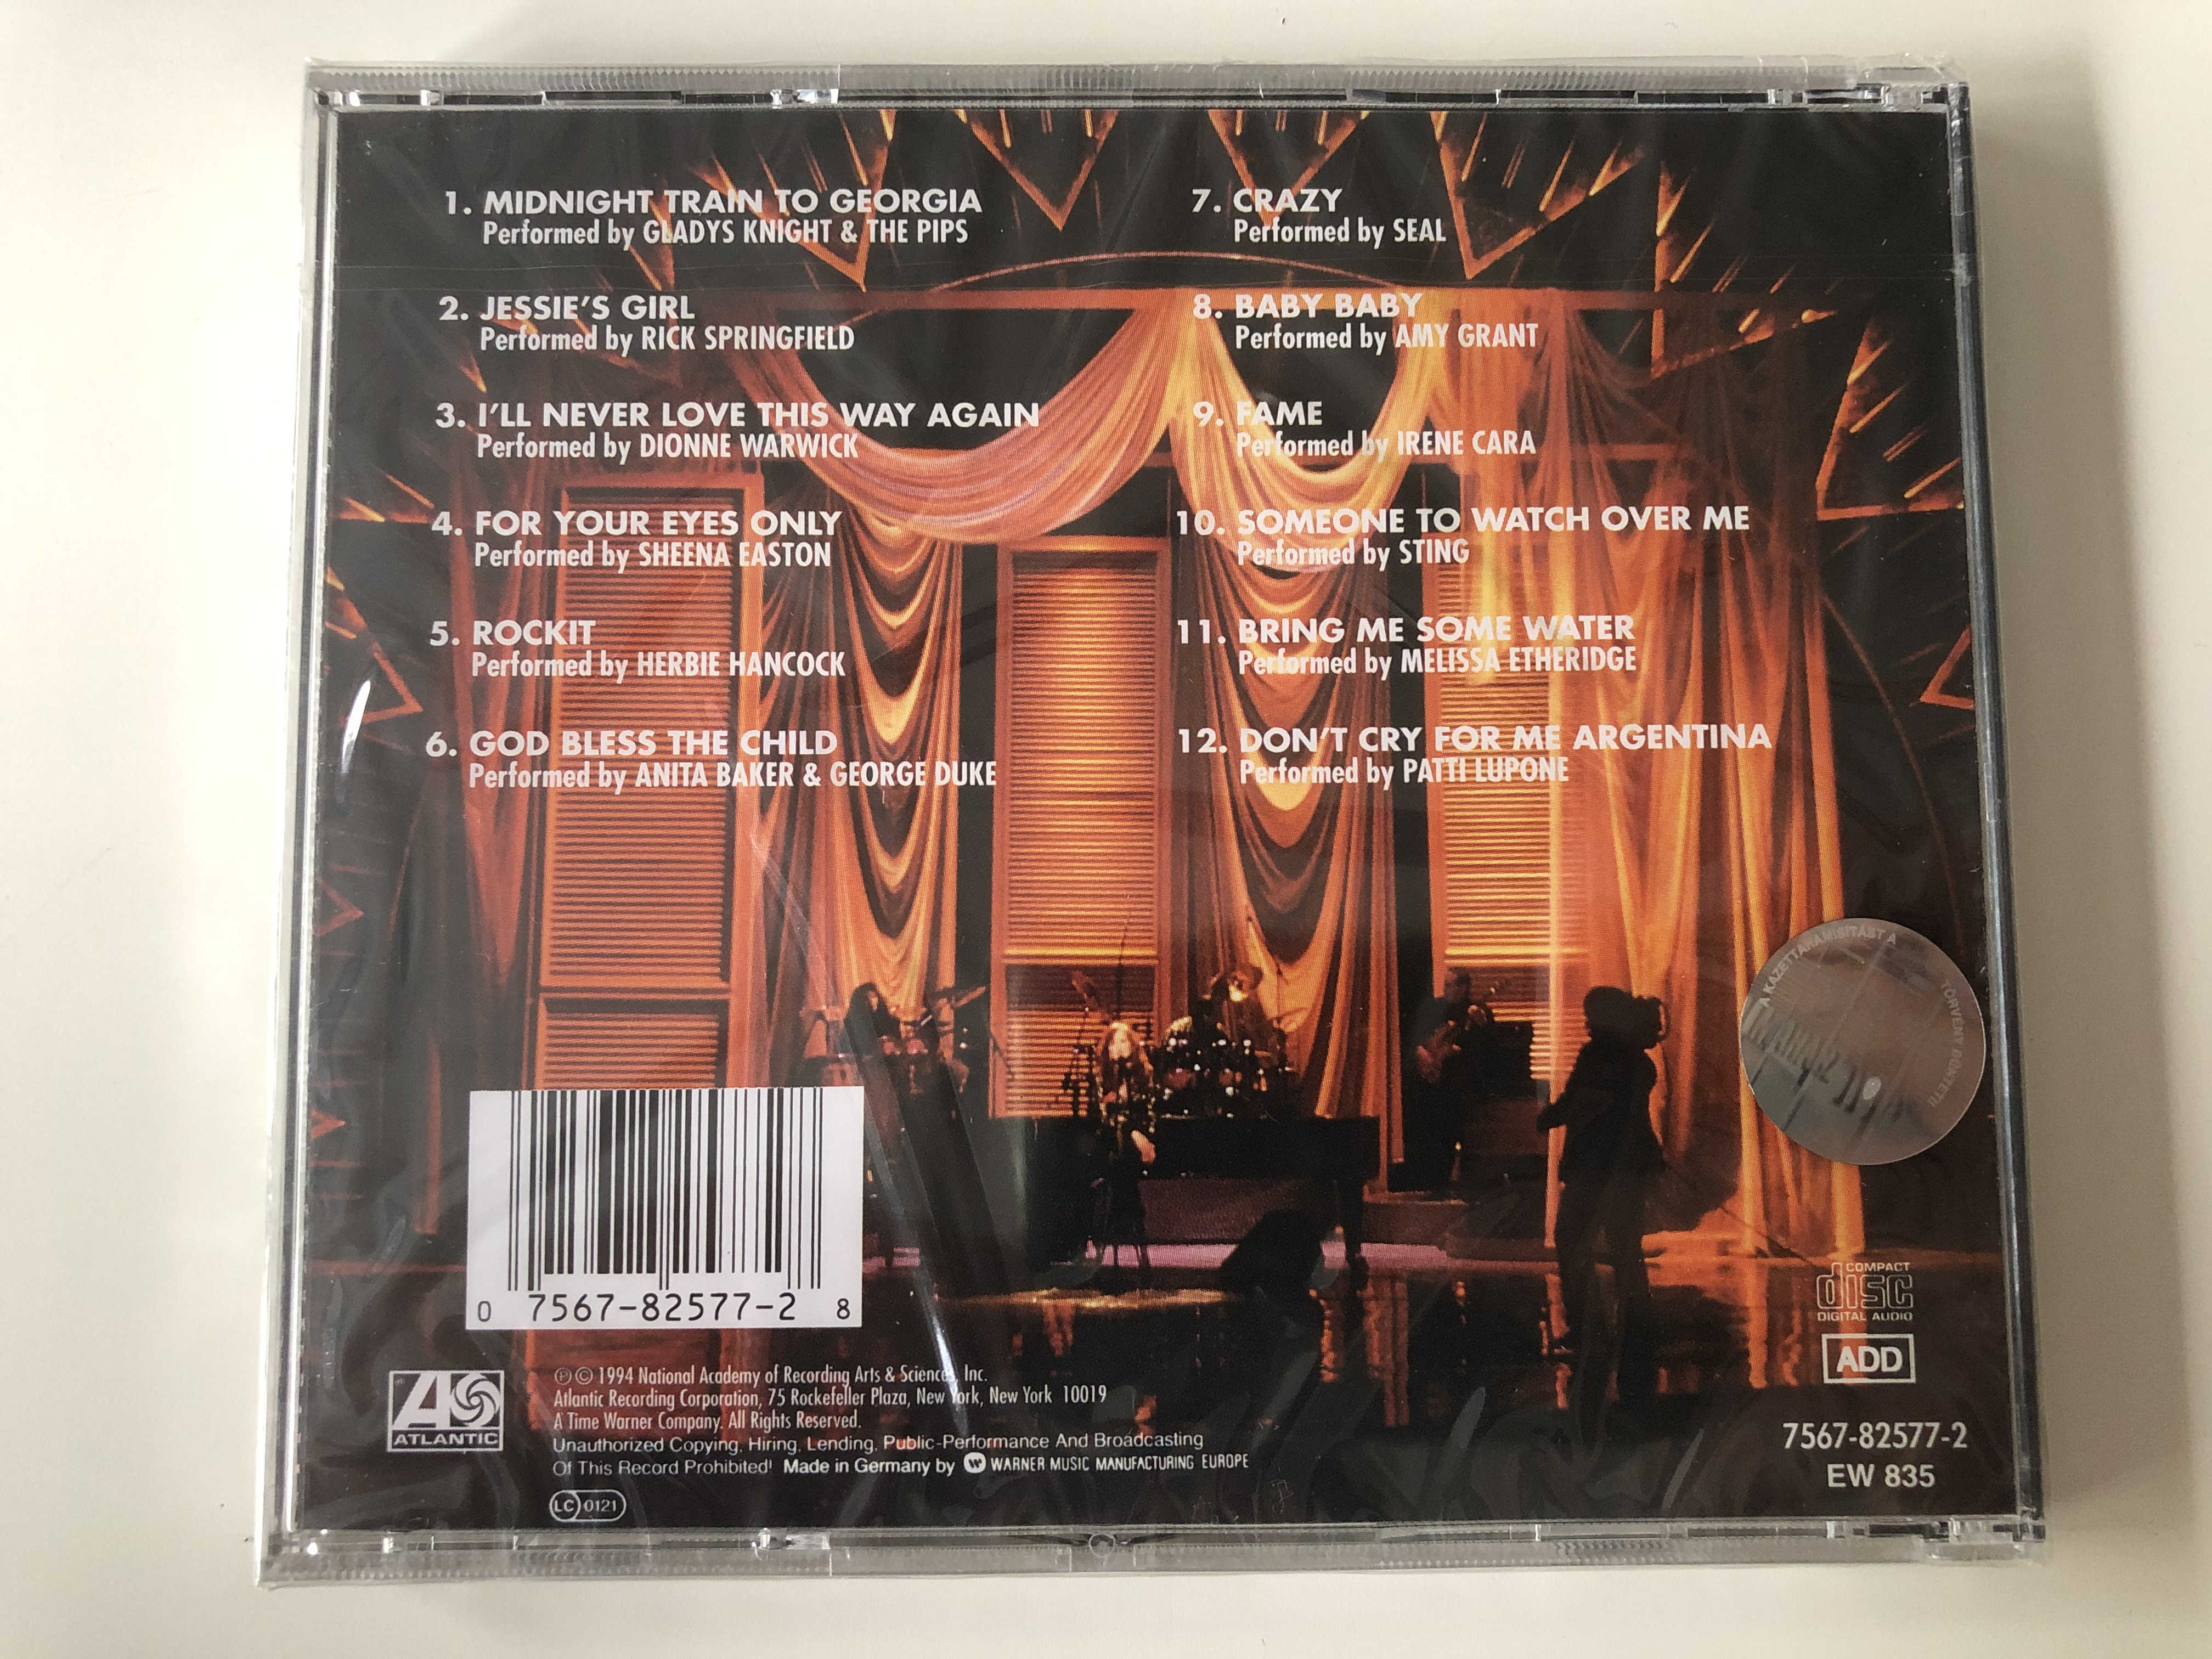 grammy-s-greatest-moments-volume-iv-atlantic-audio-cd-1994-7567-82577-2-2-.jpg